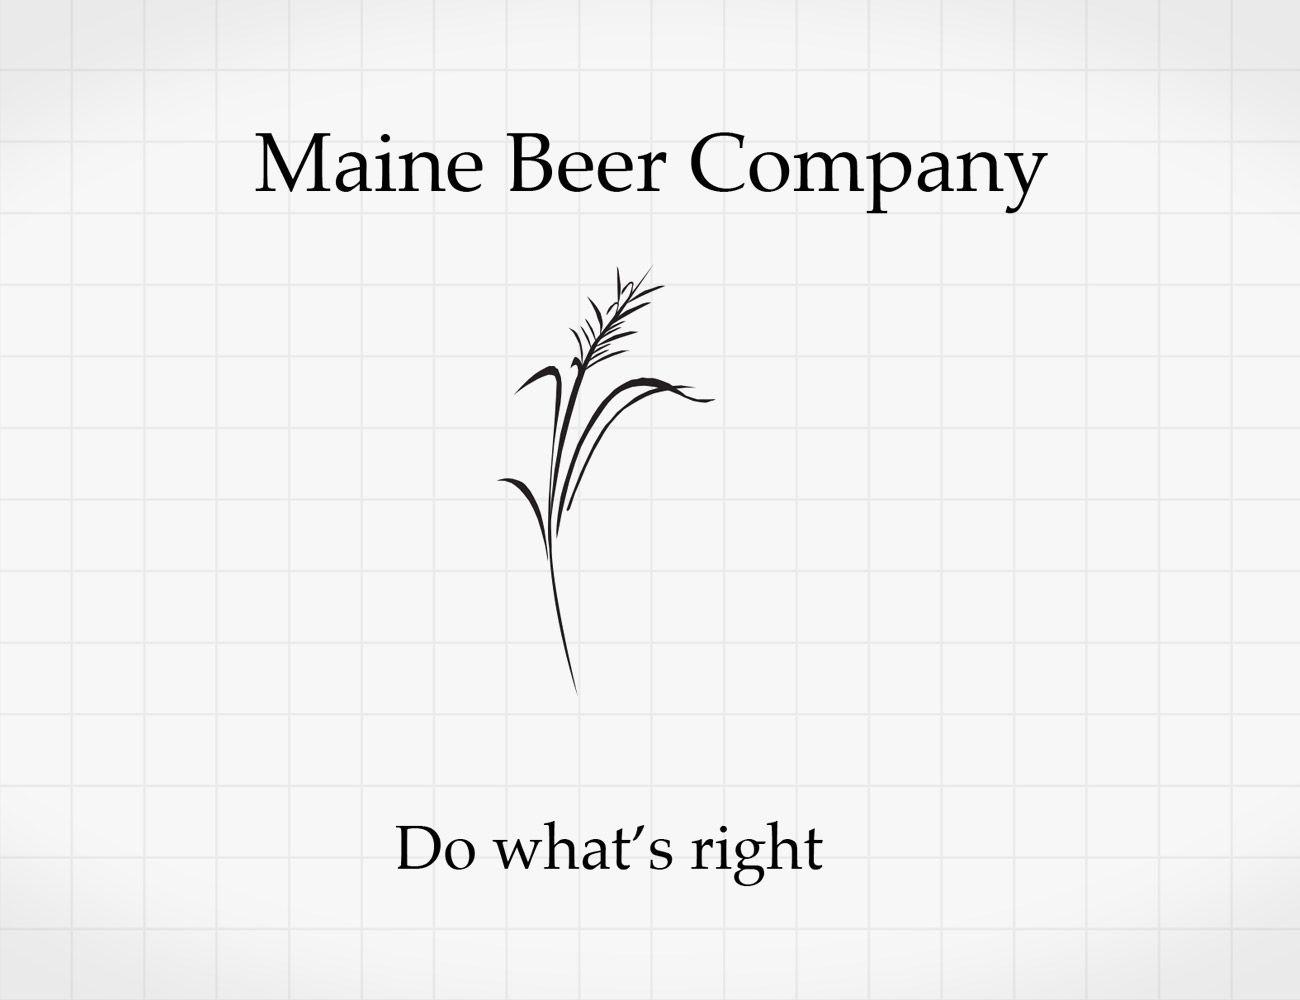 maine-beer-company-logo-gear-patrol